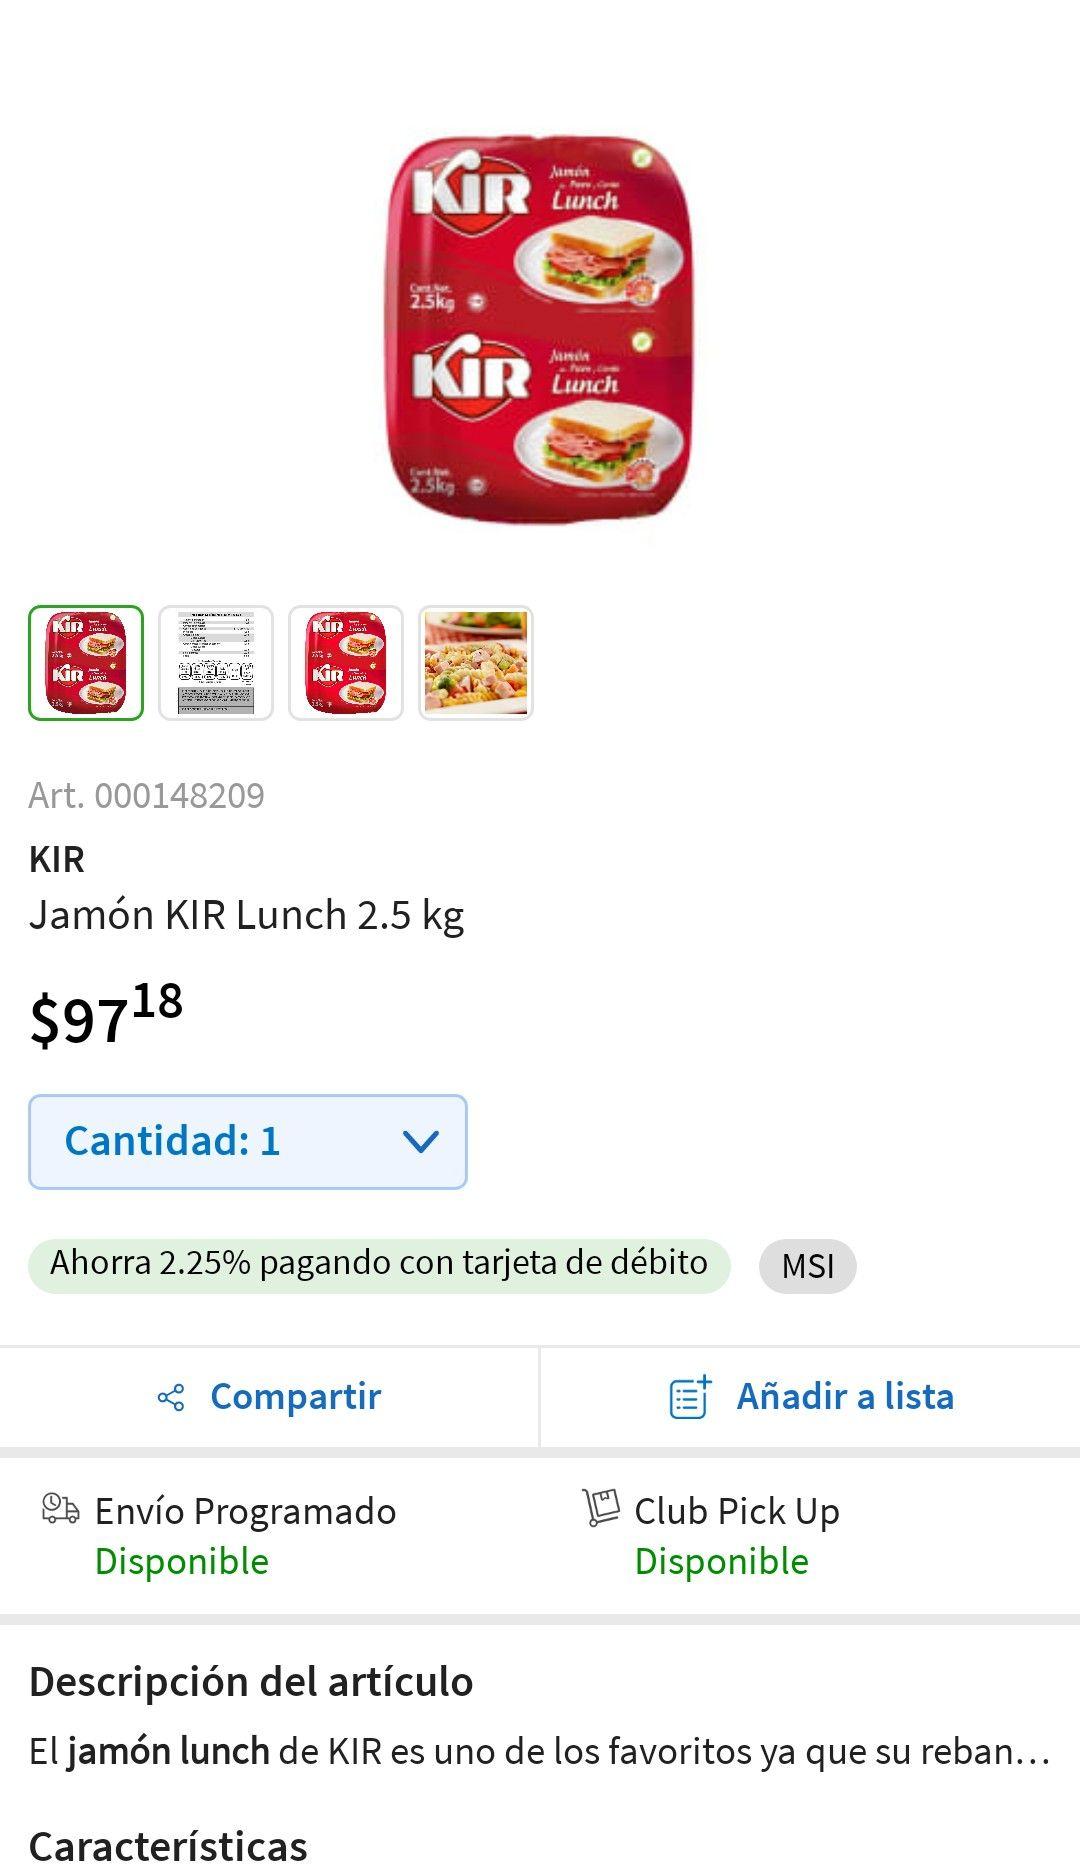 Sam's Club: Jamón de cerdo y pavo kir 2.5 kg